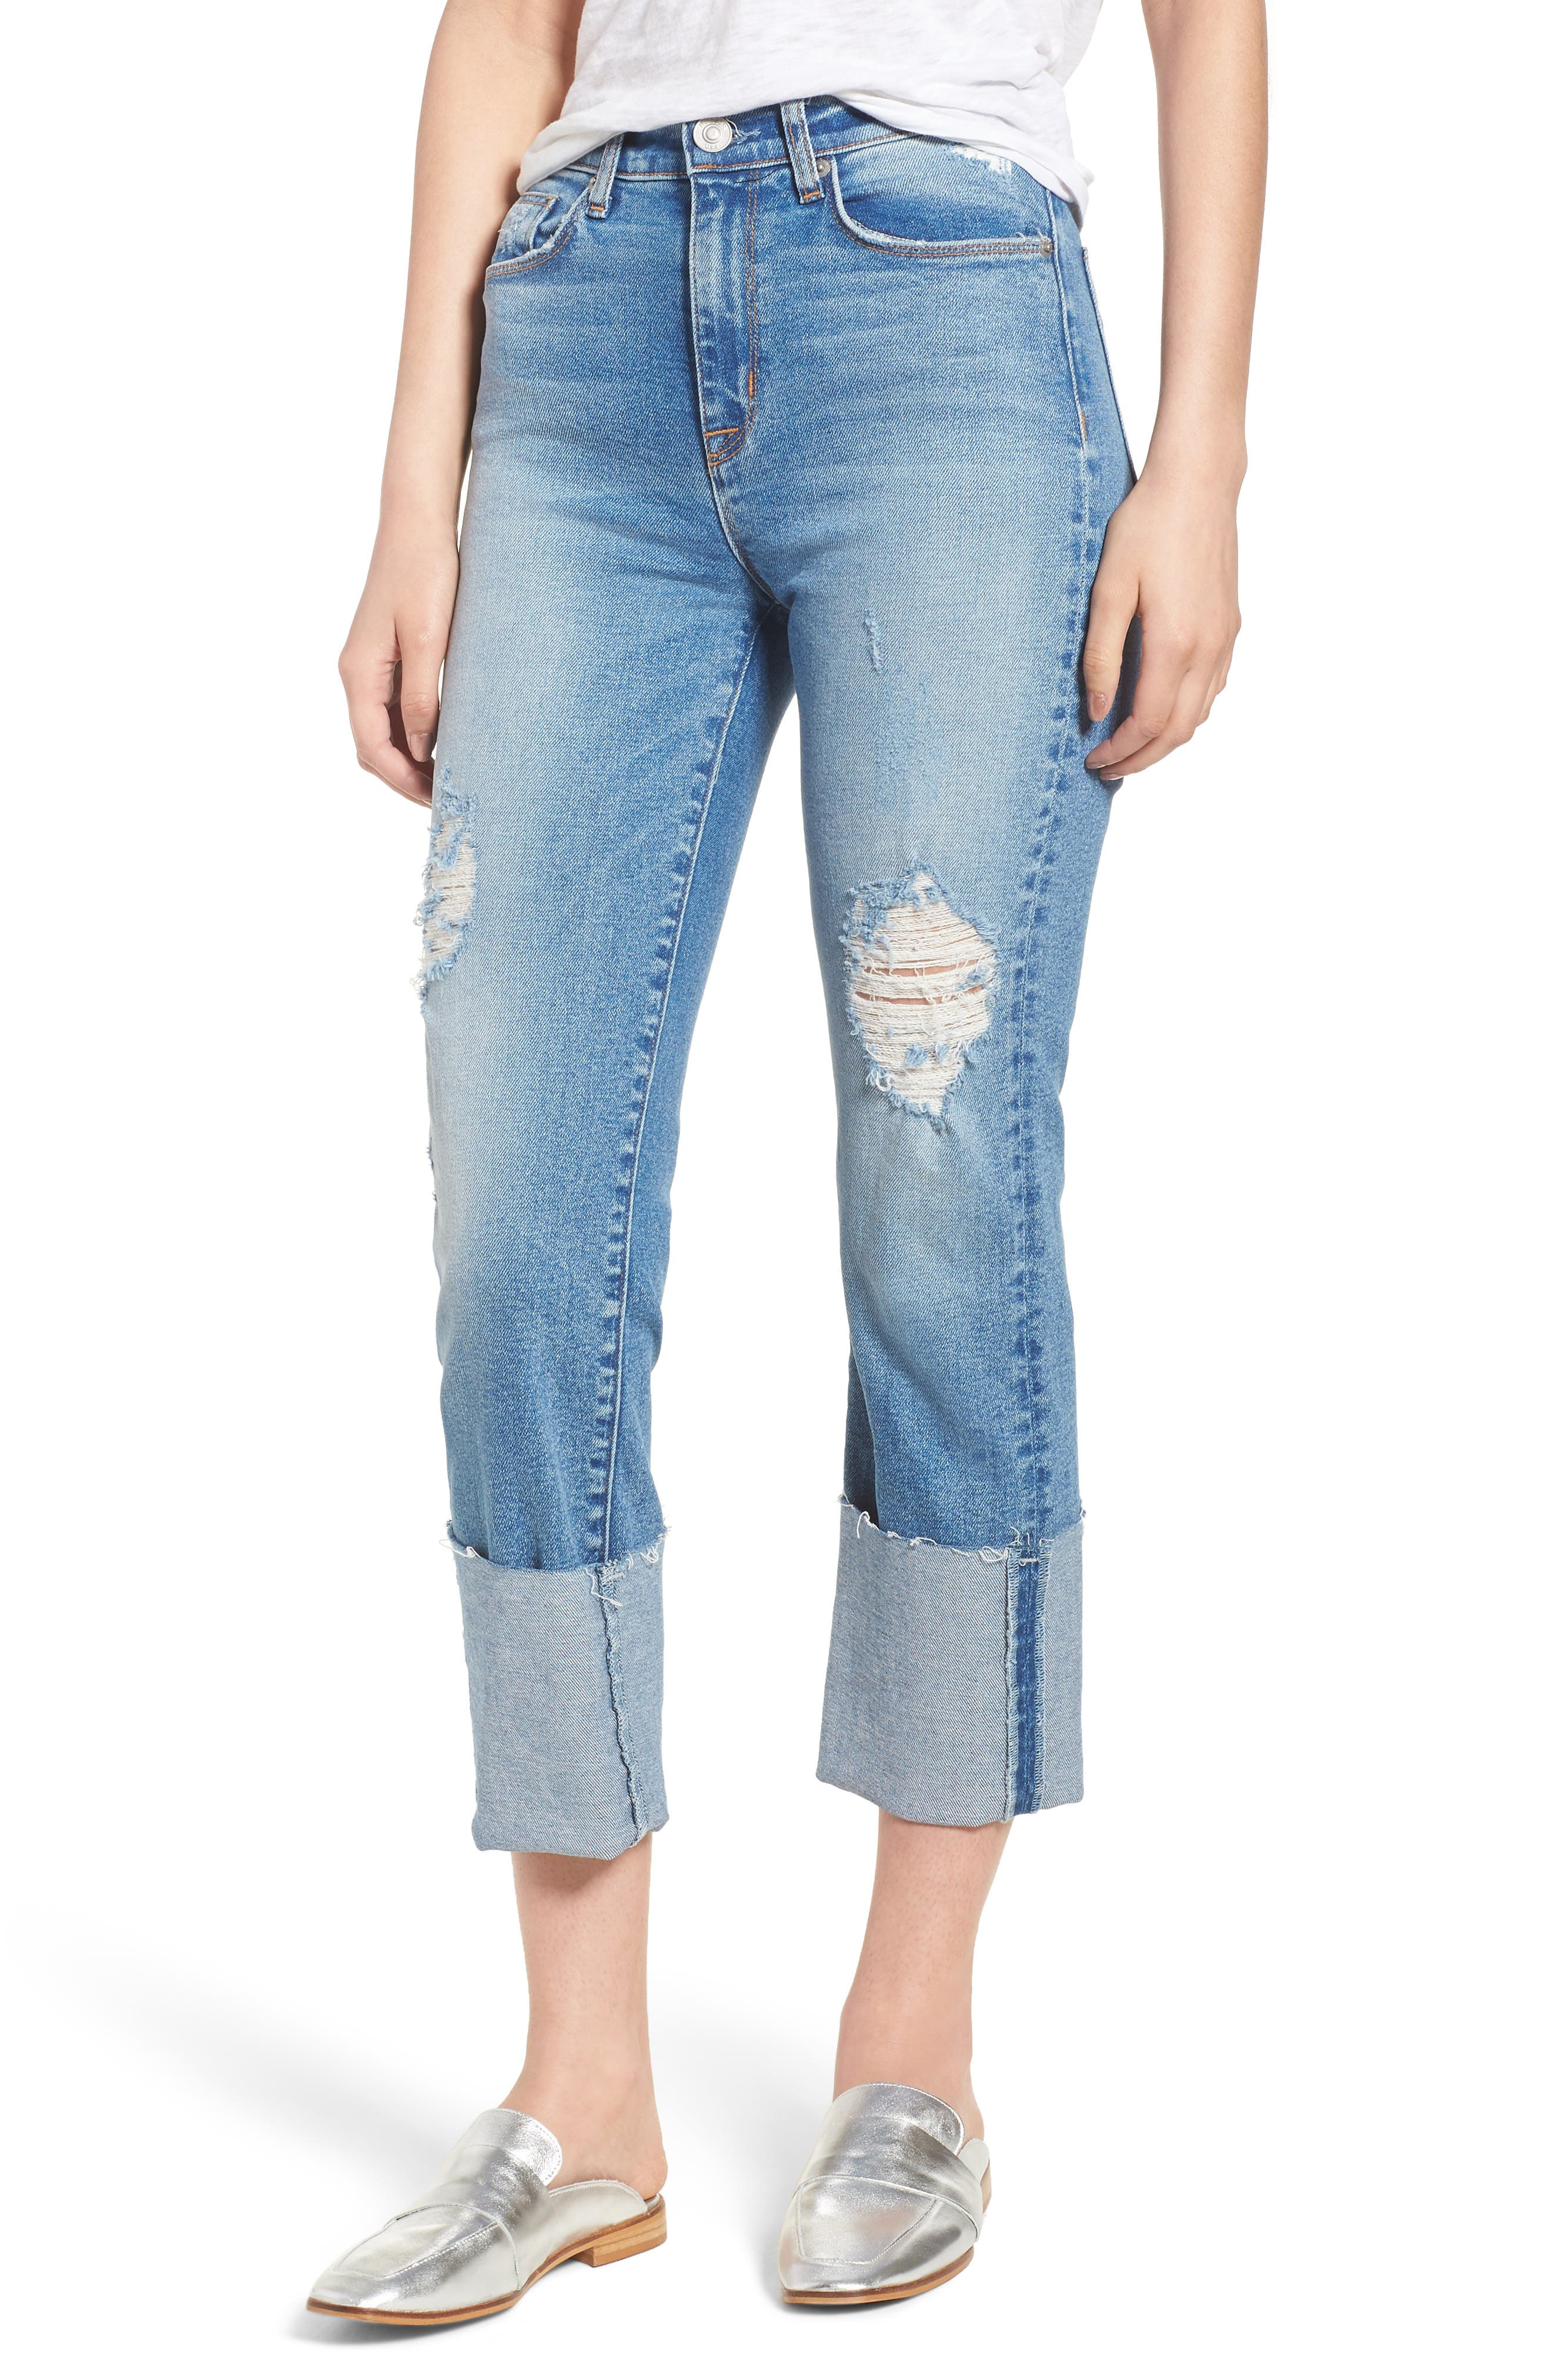 Zoeey High Waist Cuff Straight Leg Jeans,                             Main thumbnail 1, color,                             425